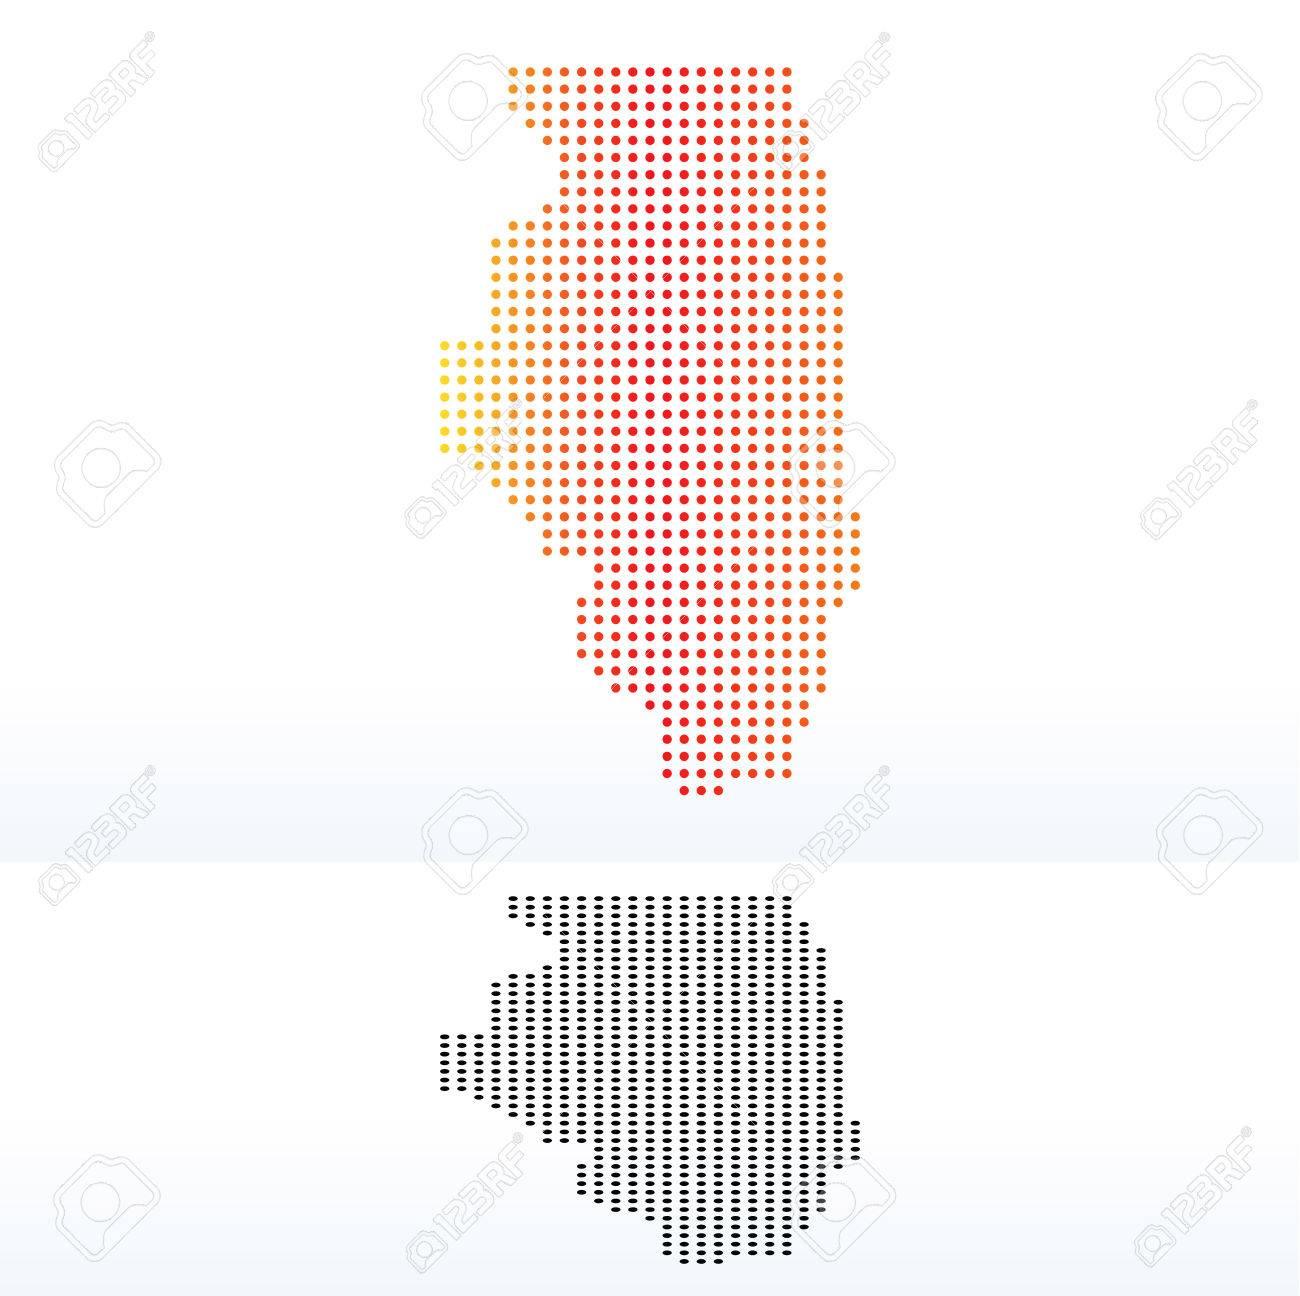 Vector Image - Map of USA Illinois State with Dot Pattern on detroit map usa, the word usa, hispanic population map usa, new york on map of usa,